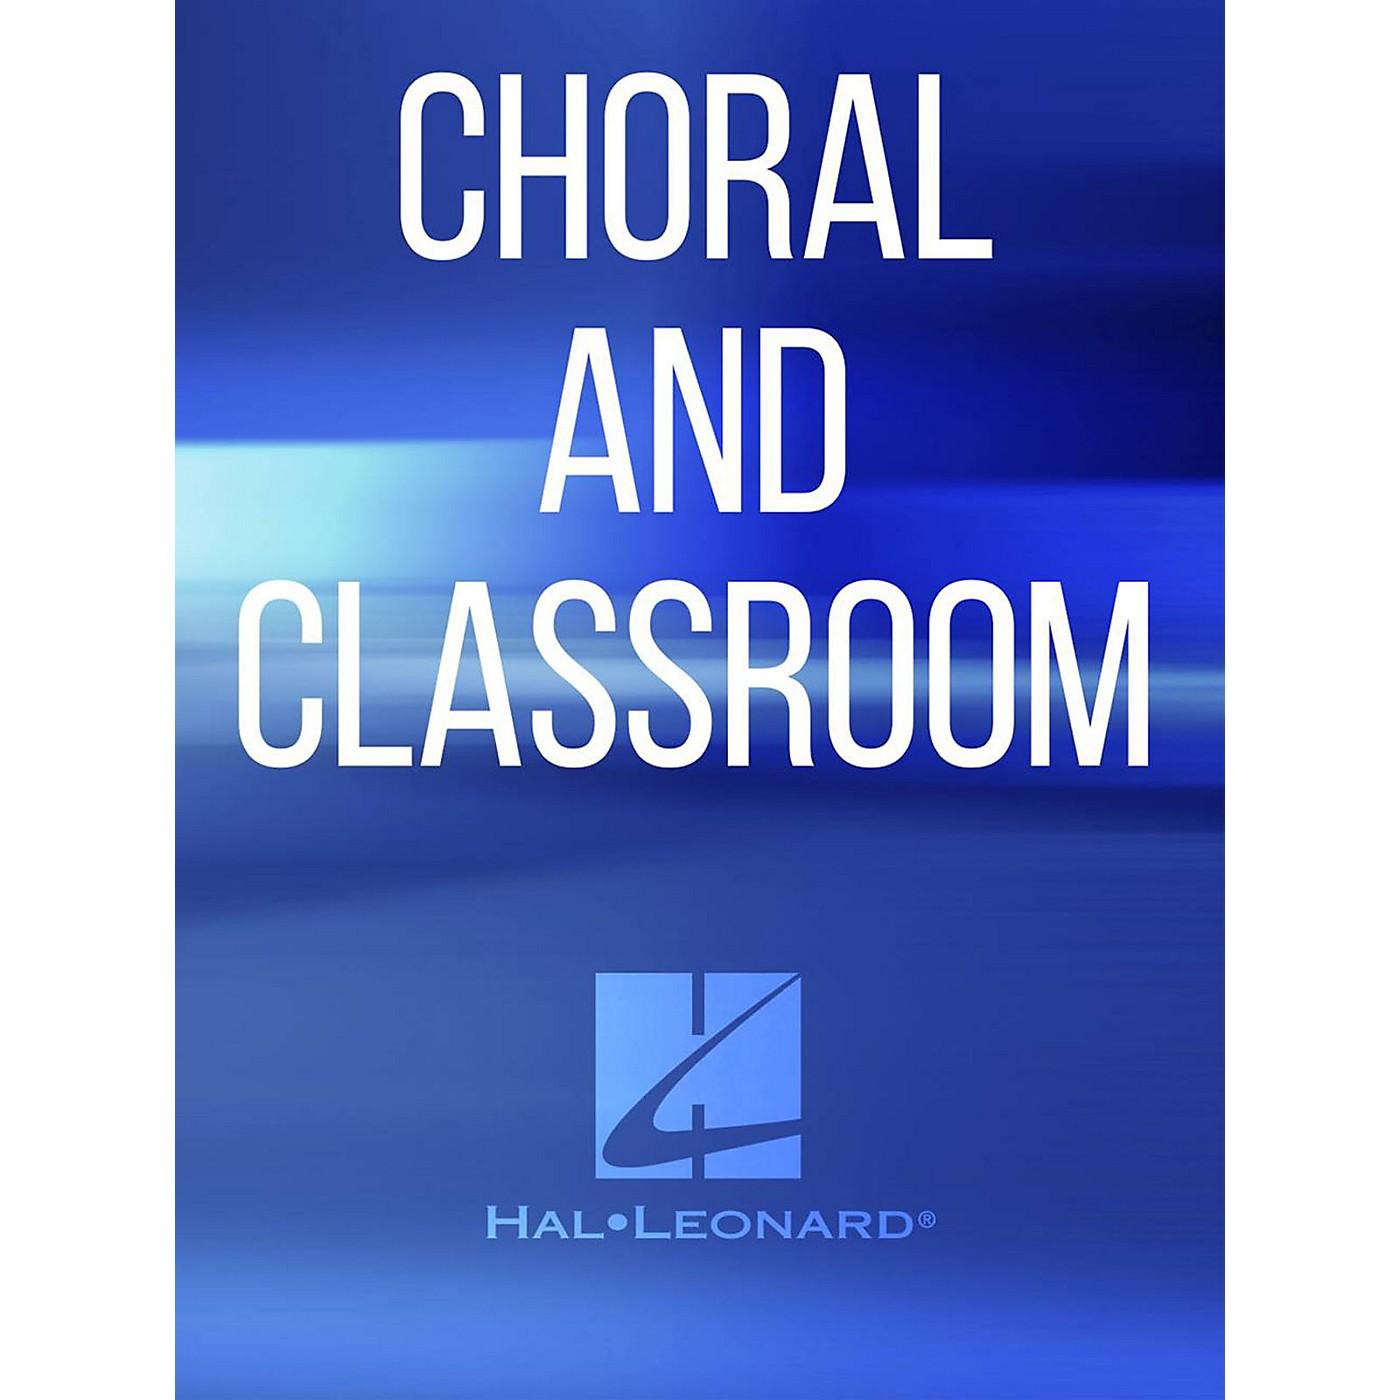 Hal Leonard Make a Joyful Noise! SATB Composed by Don Whitman thumbnail